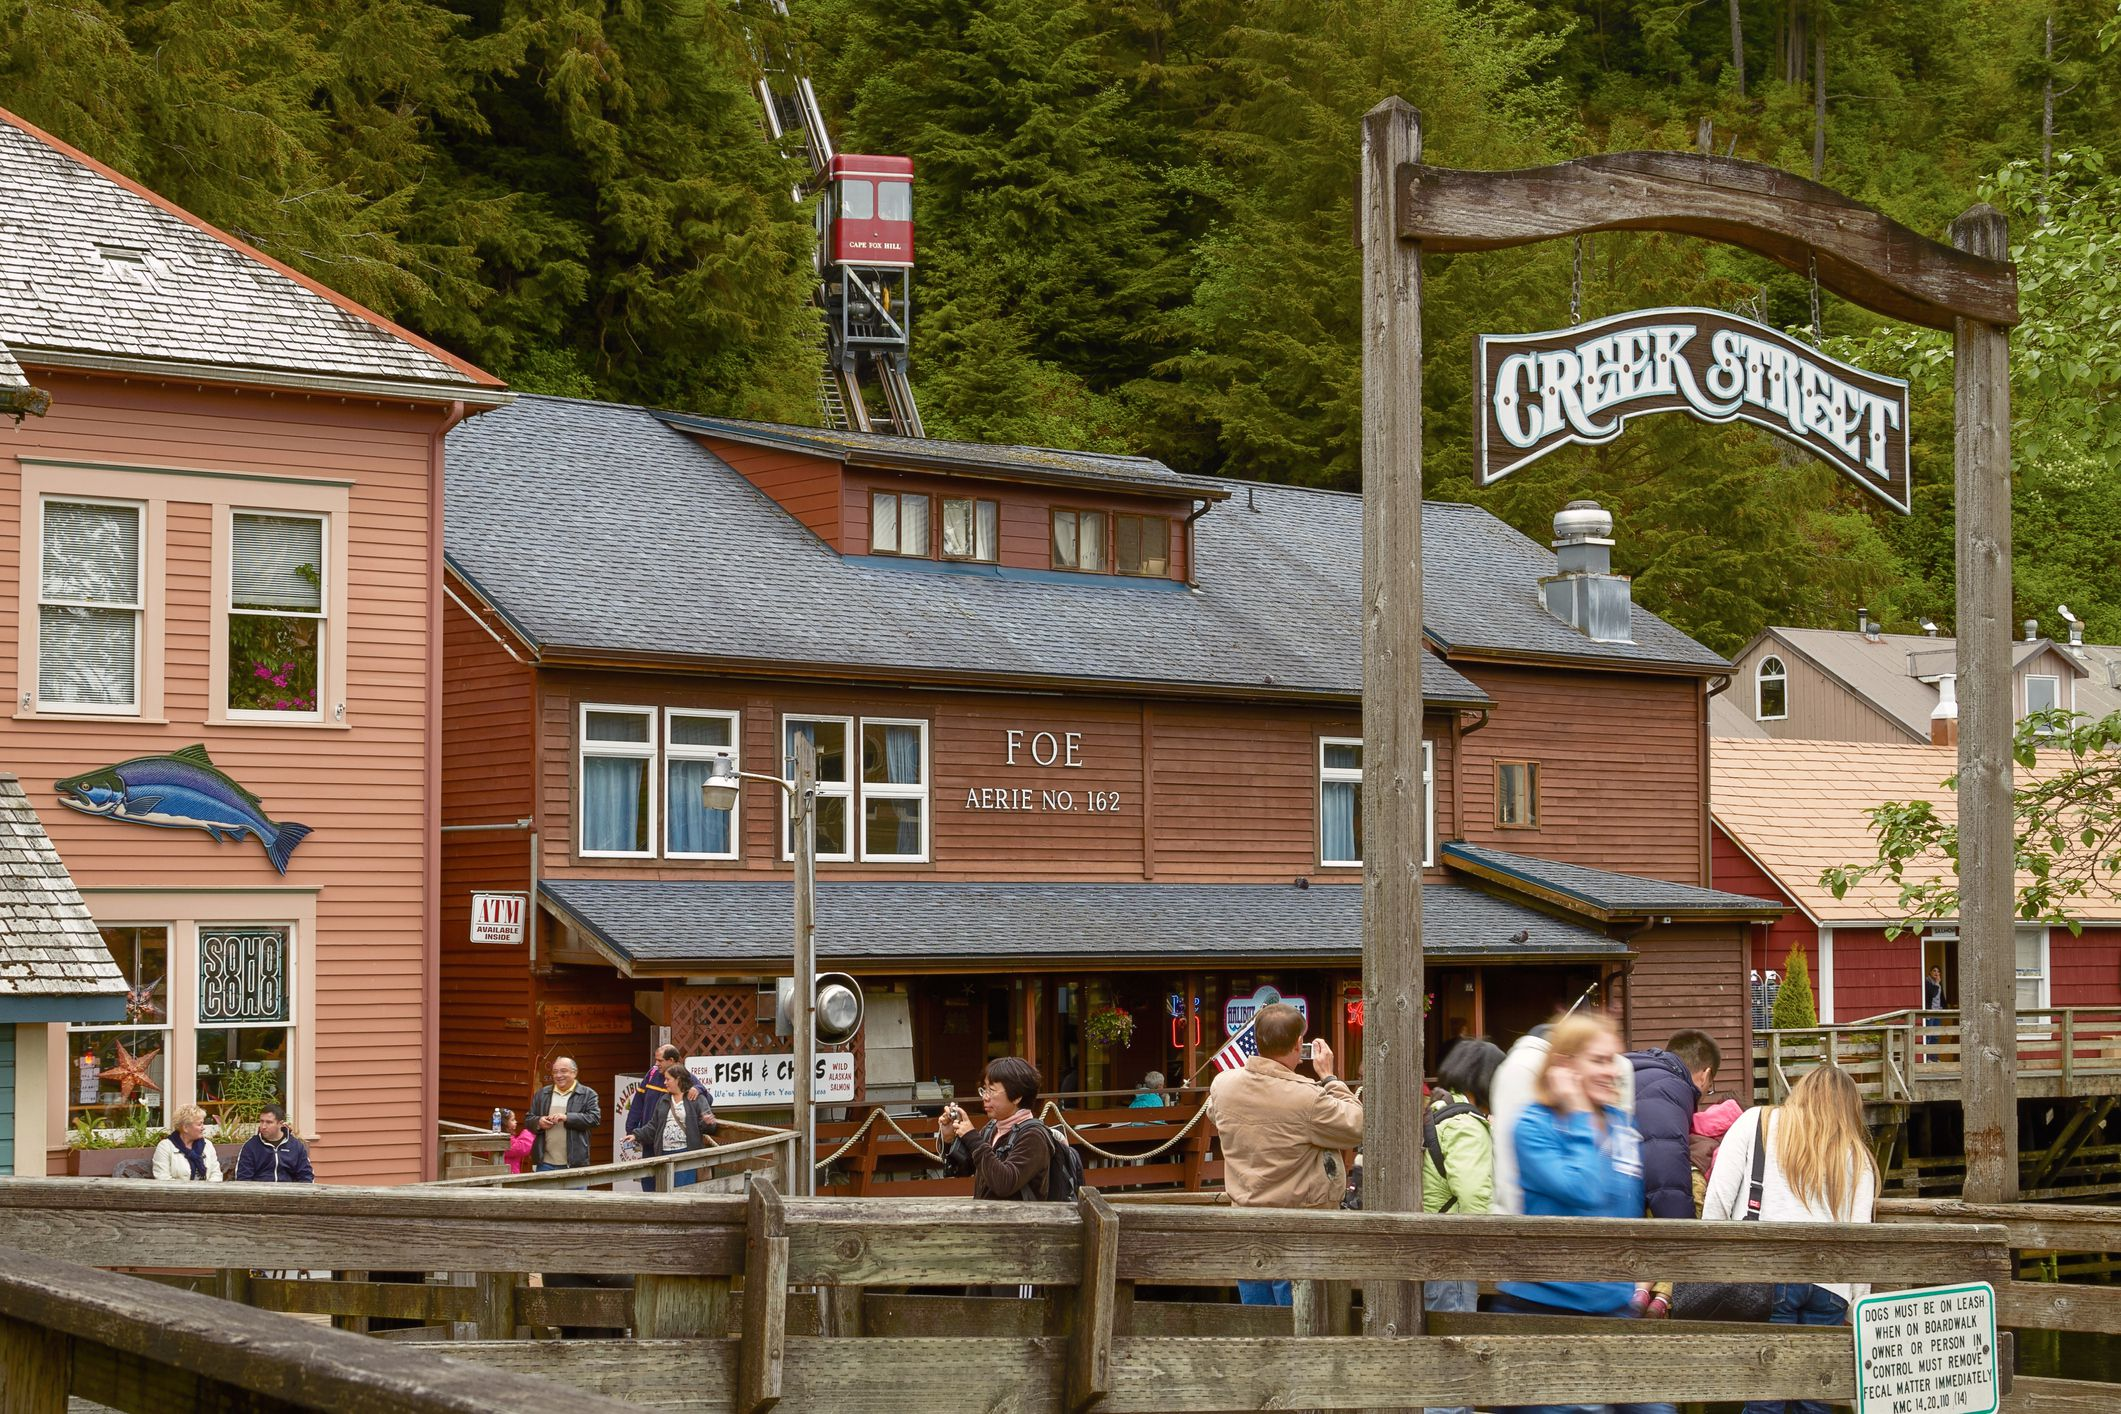 People Enjoying Visit of Creek Street in Ketchikan Alaska